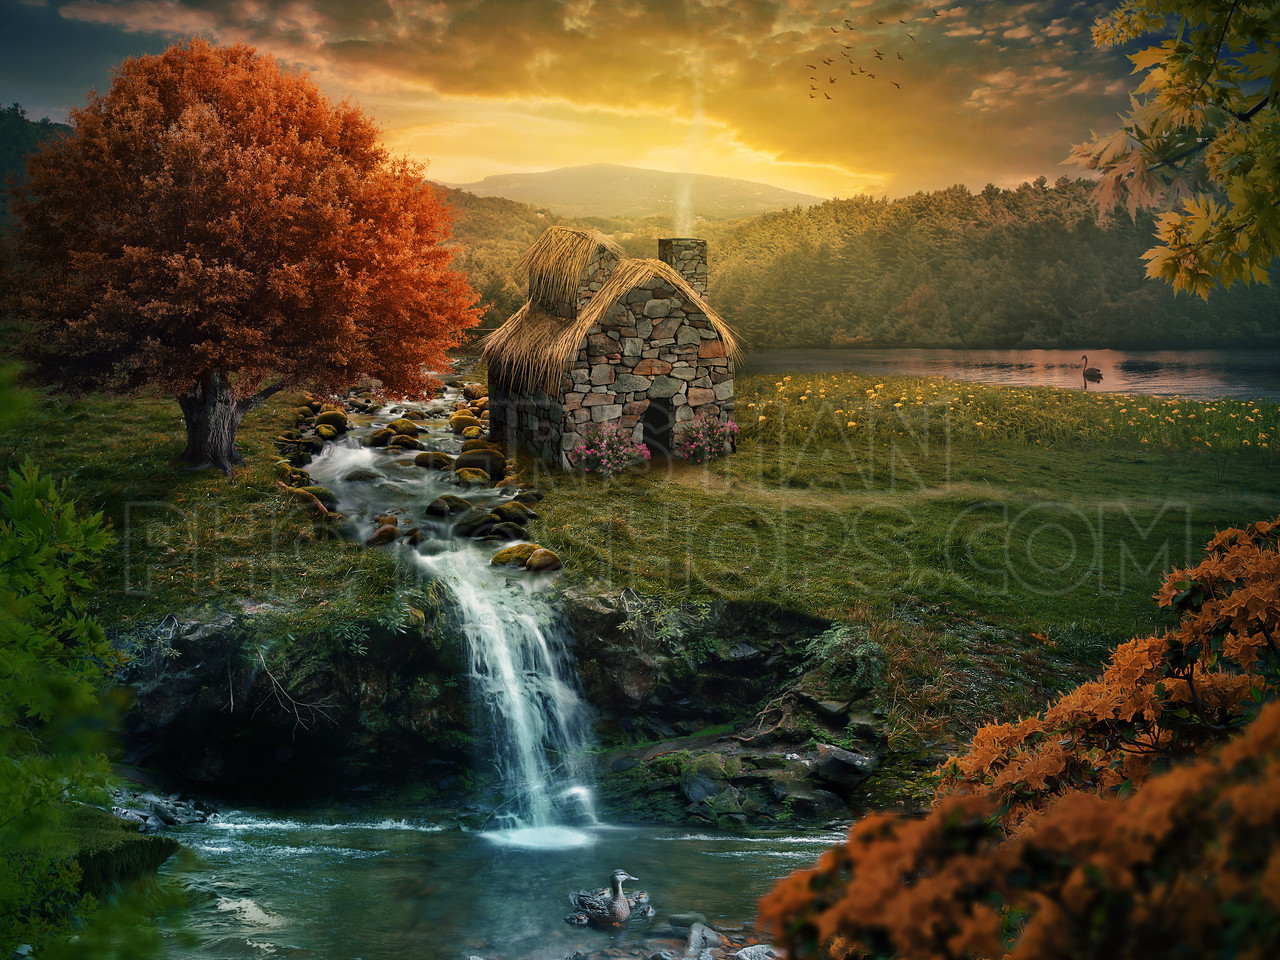 Peaceful cottage; 80cm x 60cm at 300dpi